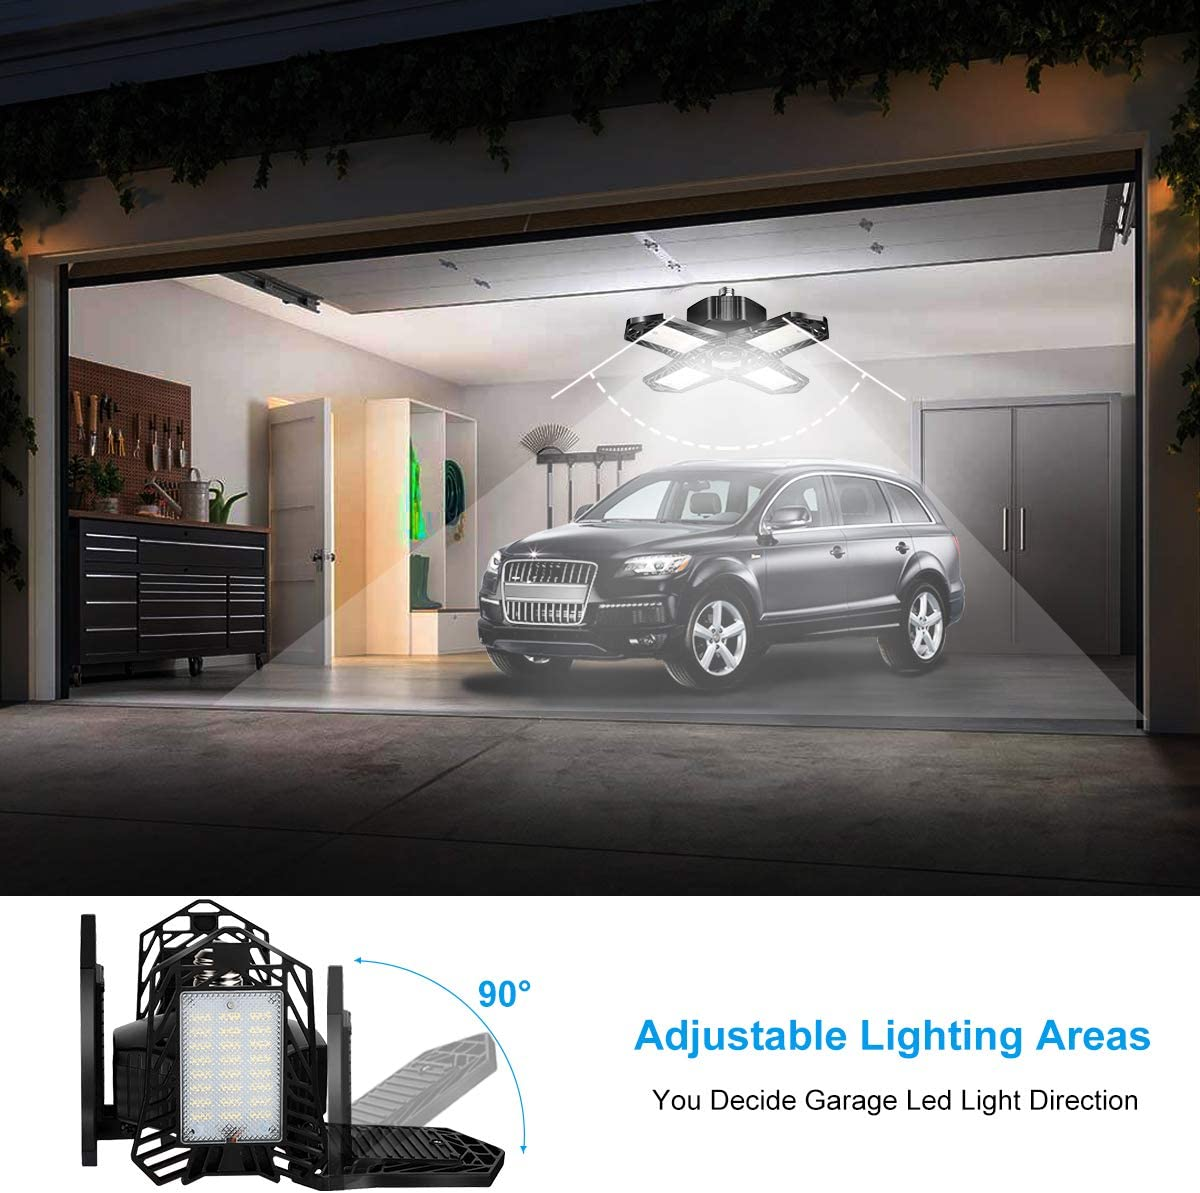 Basement Barn,Warehouse Garage Light,WOHOME 150W 15000LM LED Garage Light,E26//E27 Garage Ceiling Lighting with 4 Adjustable Panels,6500K Daylight LED for Shop